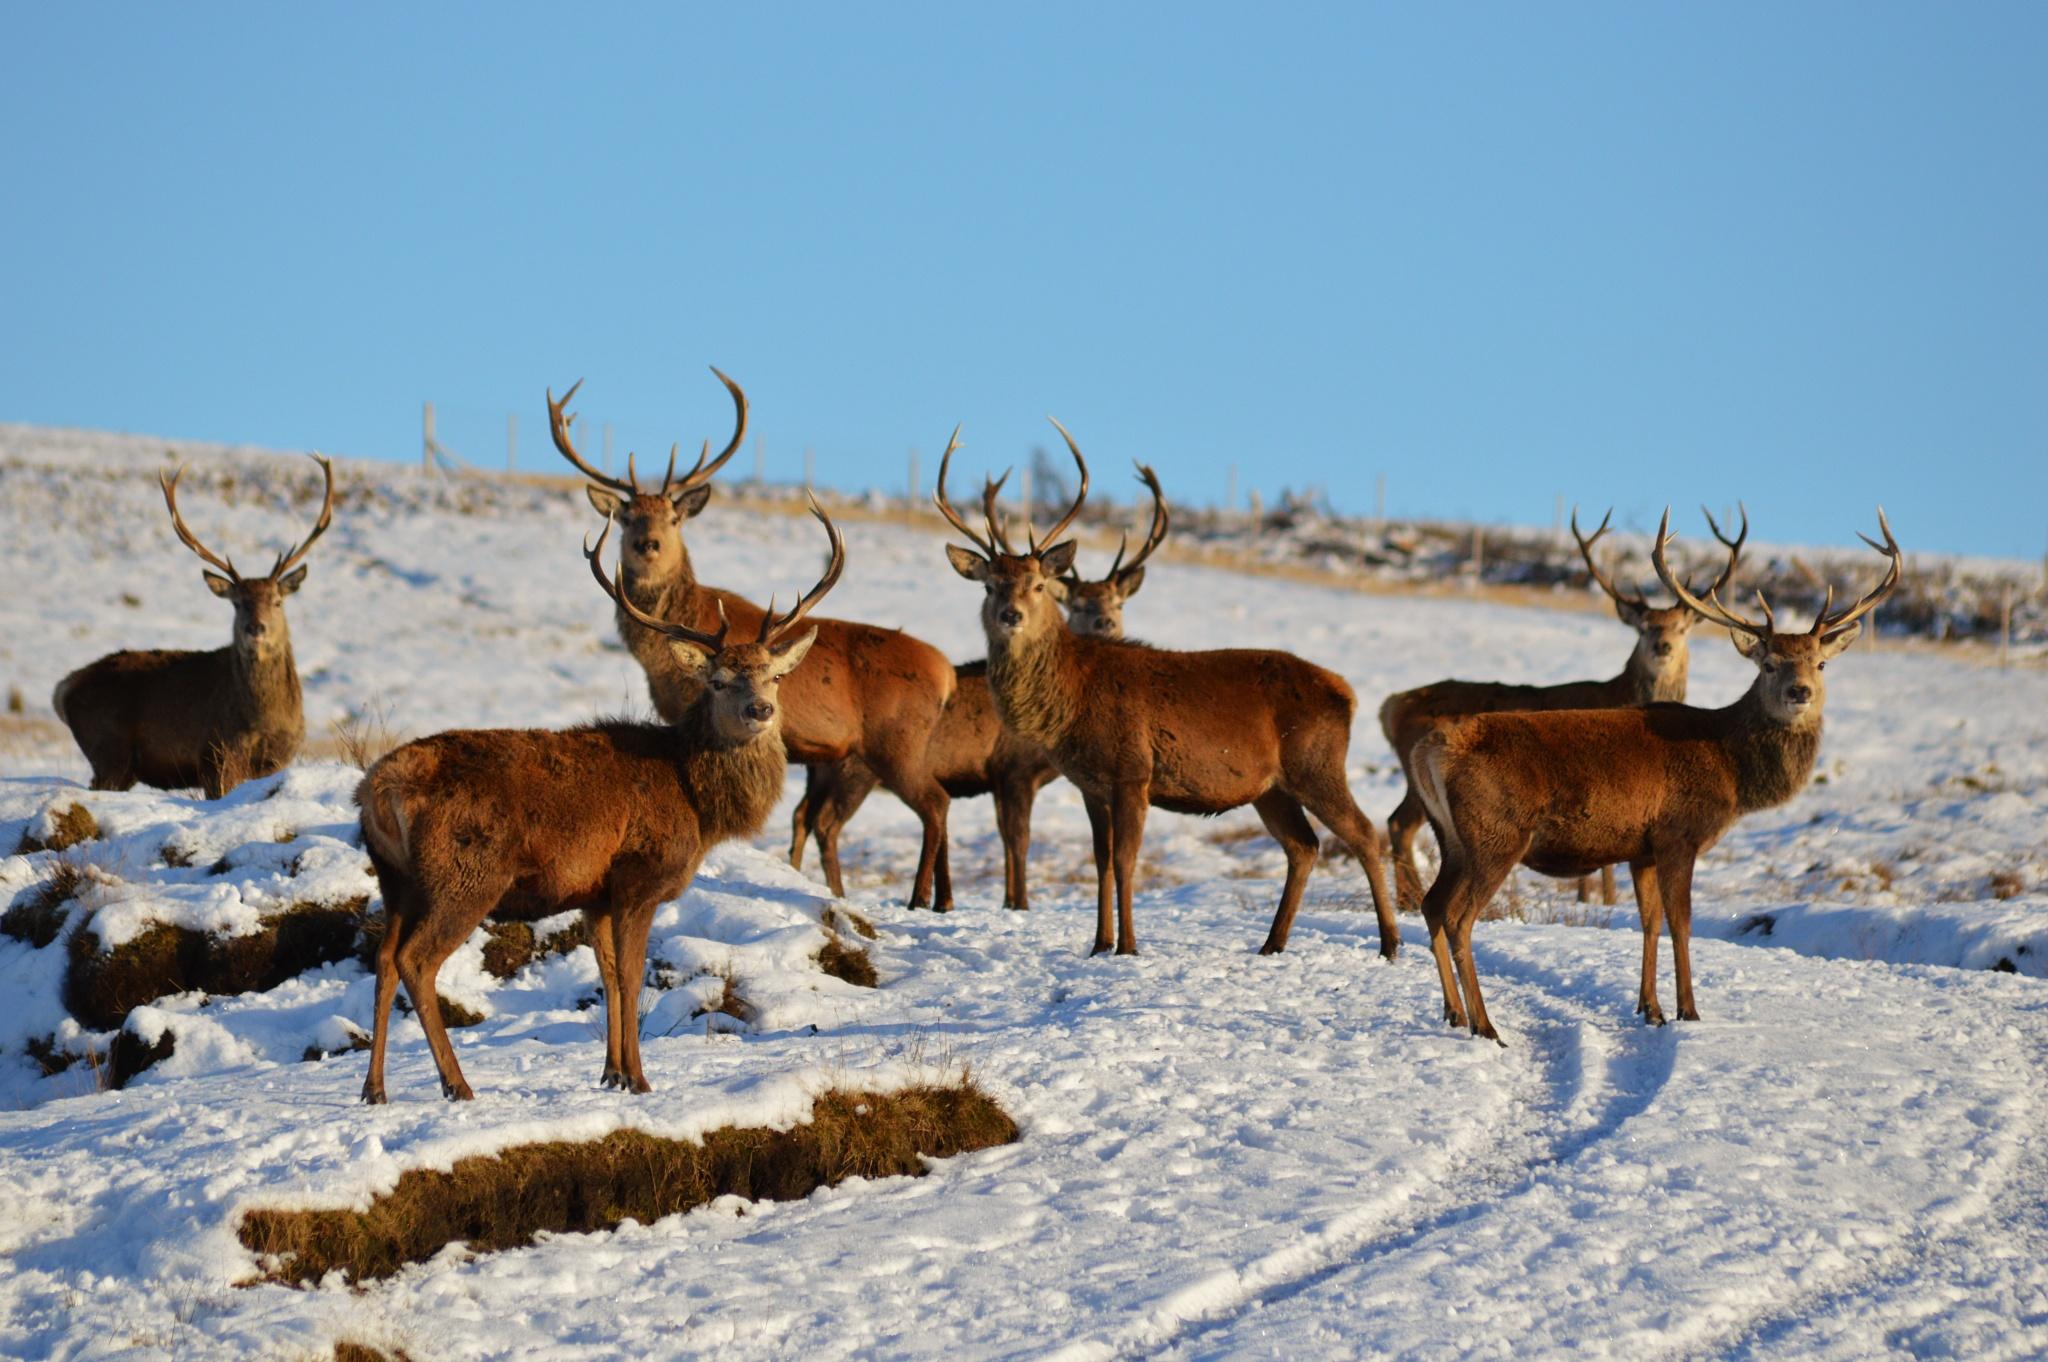 Red Deer Stag herd near Kinbrace in Sutherland, Scottish Highlands by garybr66